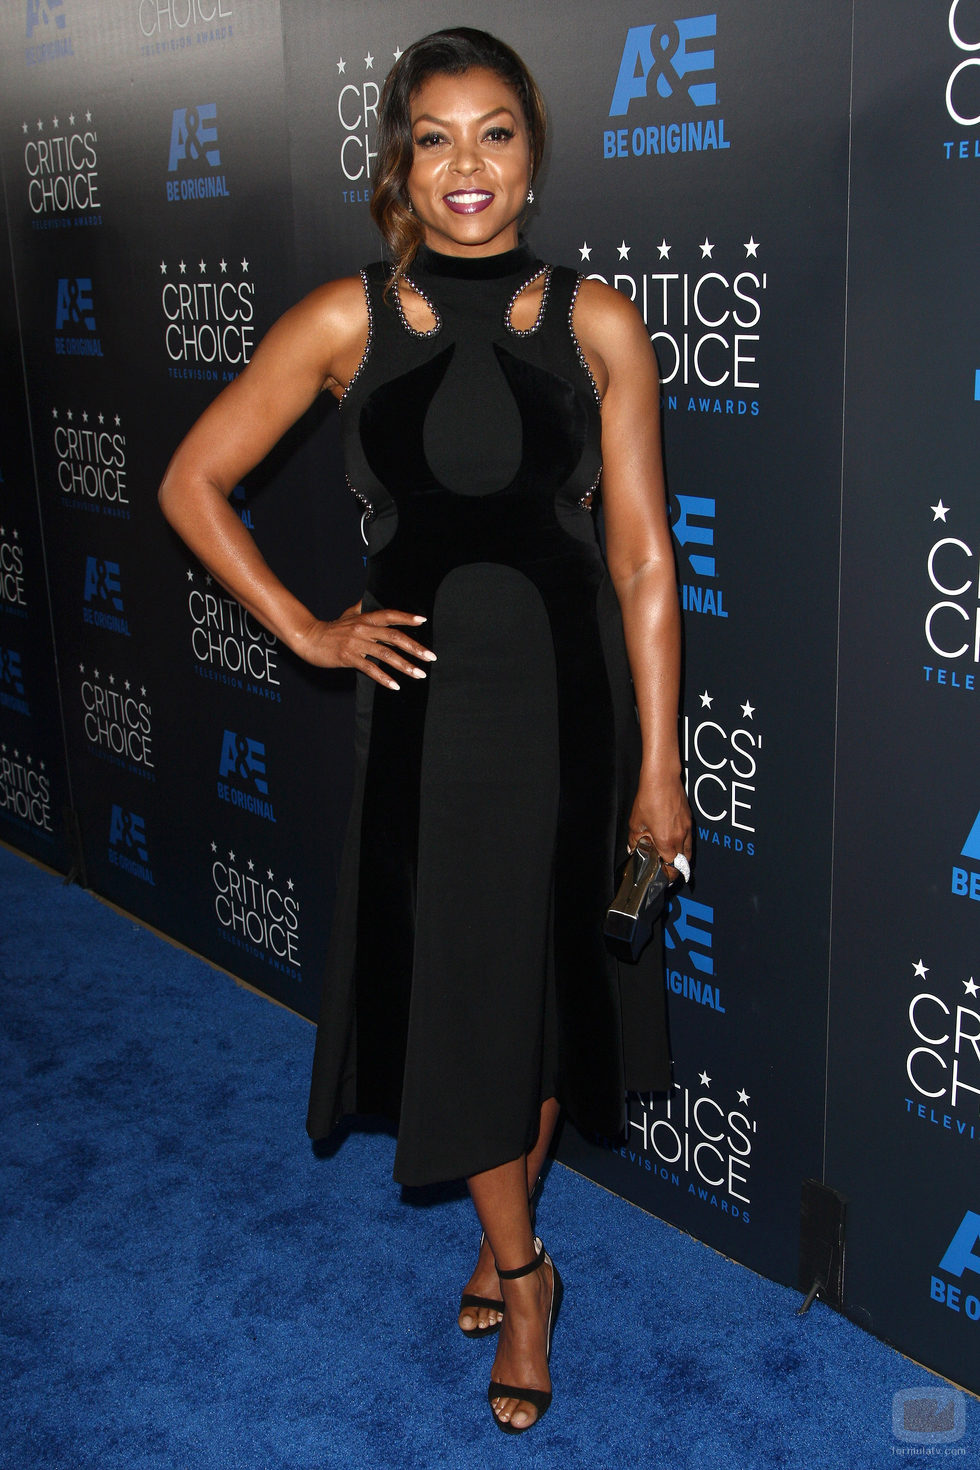 Taraji P. Henson en los Critics' Choice Awards 2015